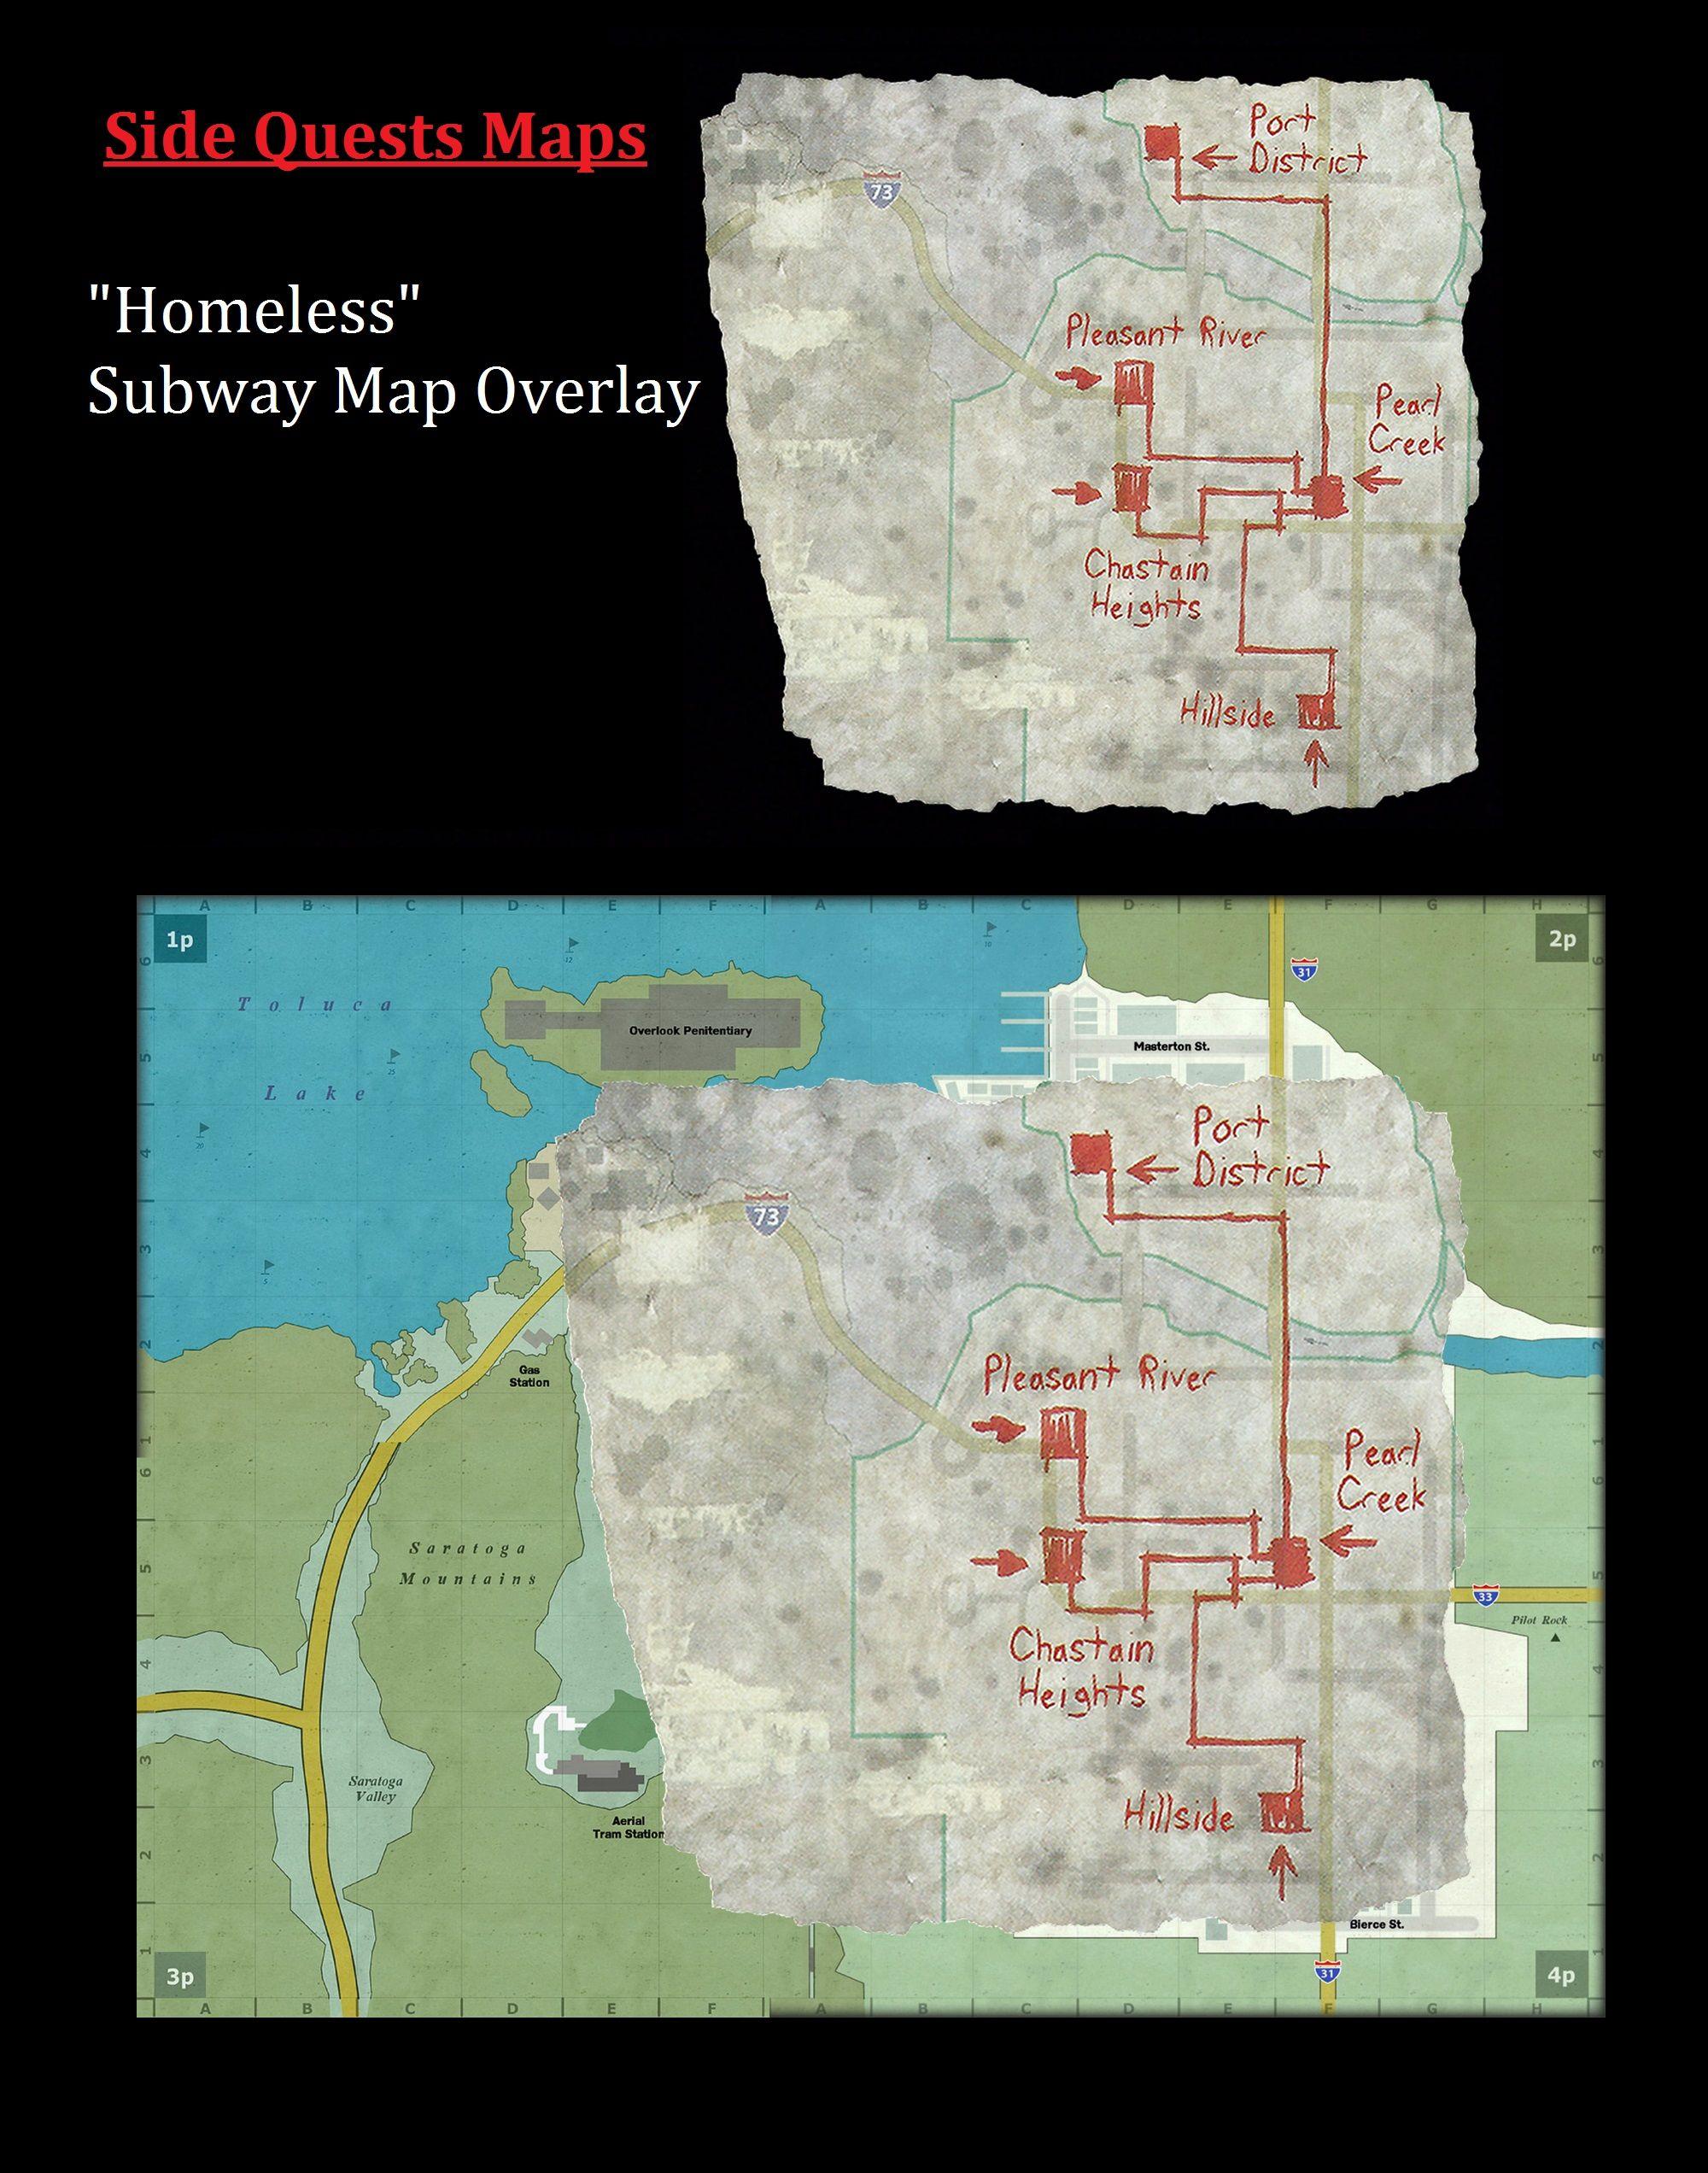 Subway Map Overlay.Homeless Silent Hill Silent Hill Subway Map Map